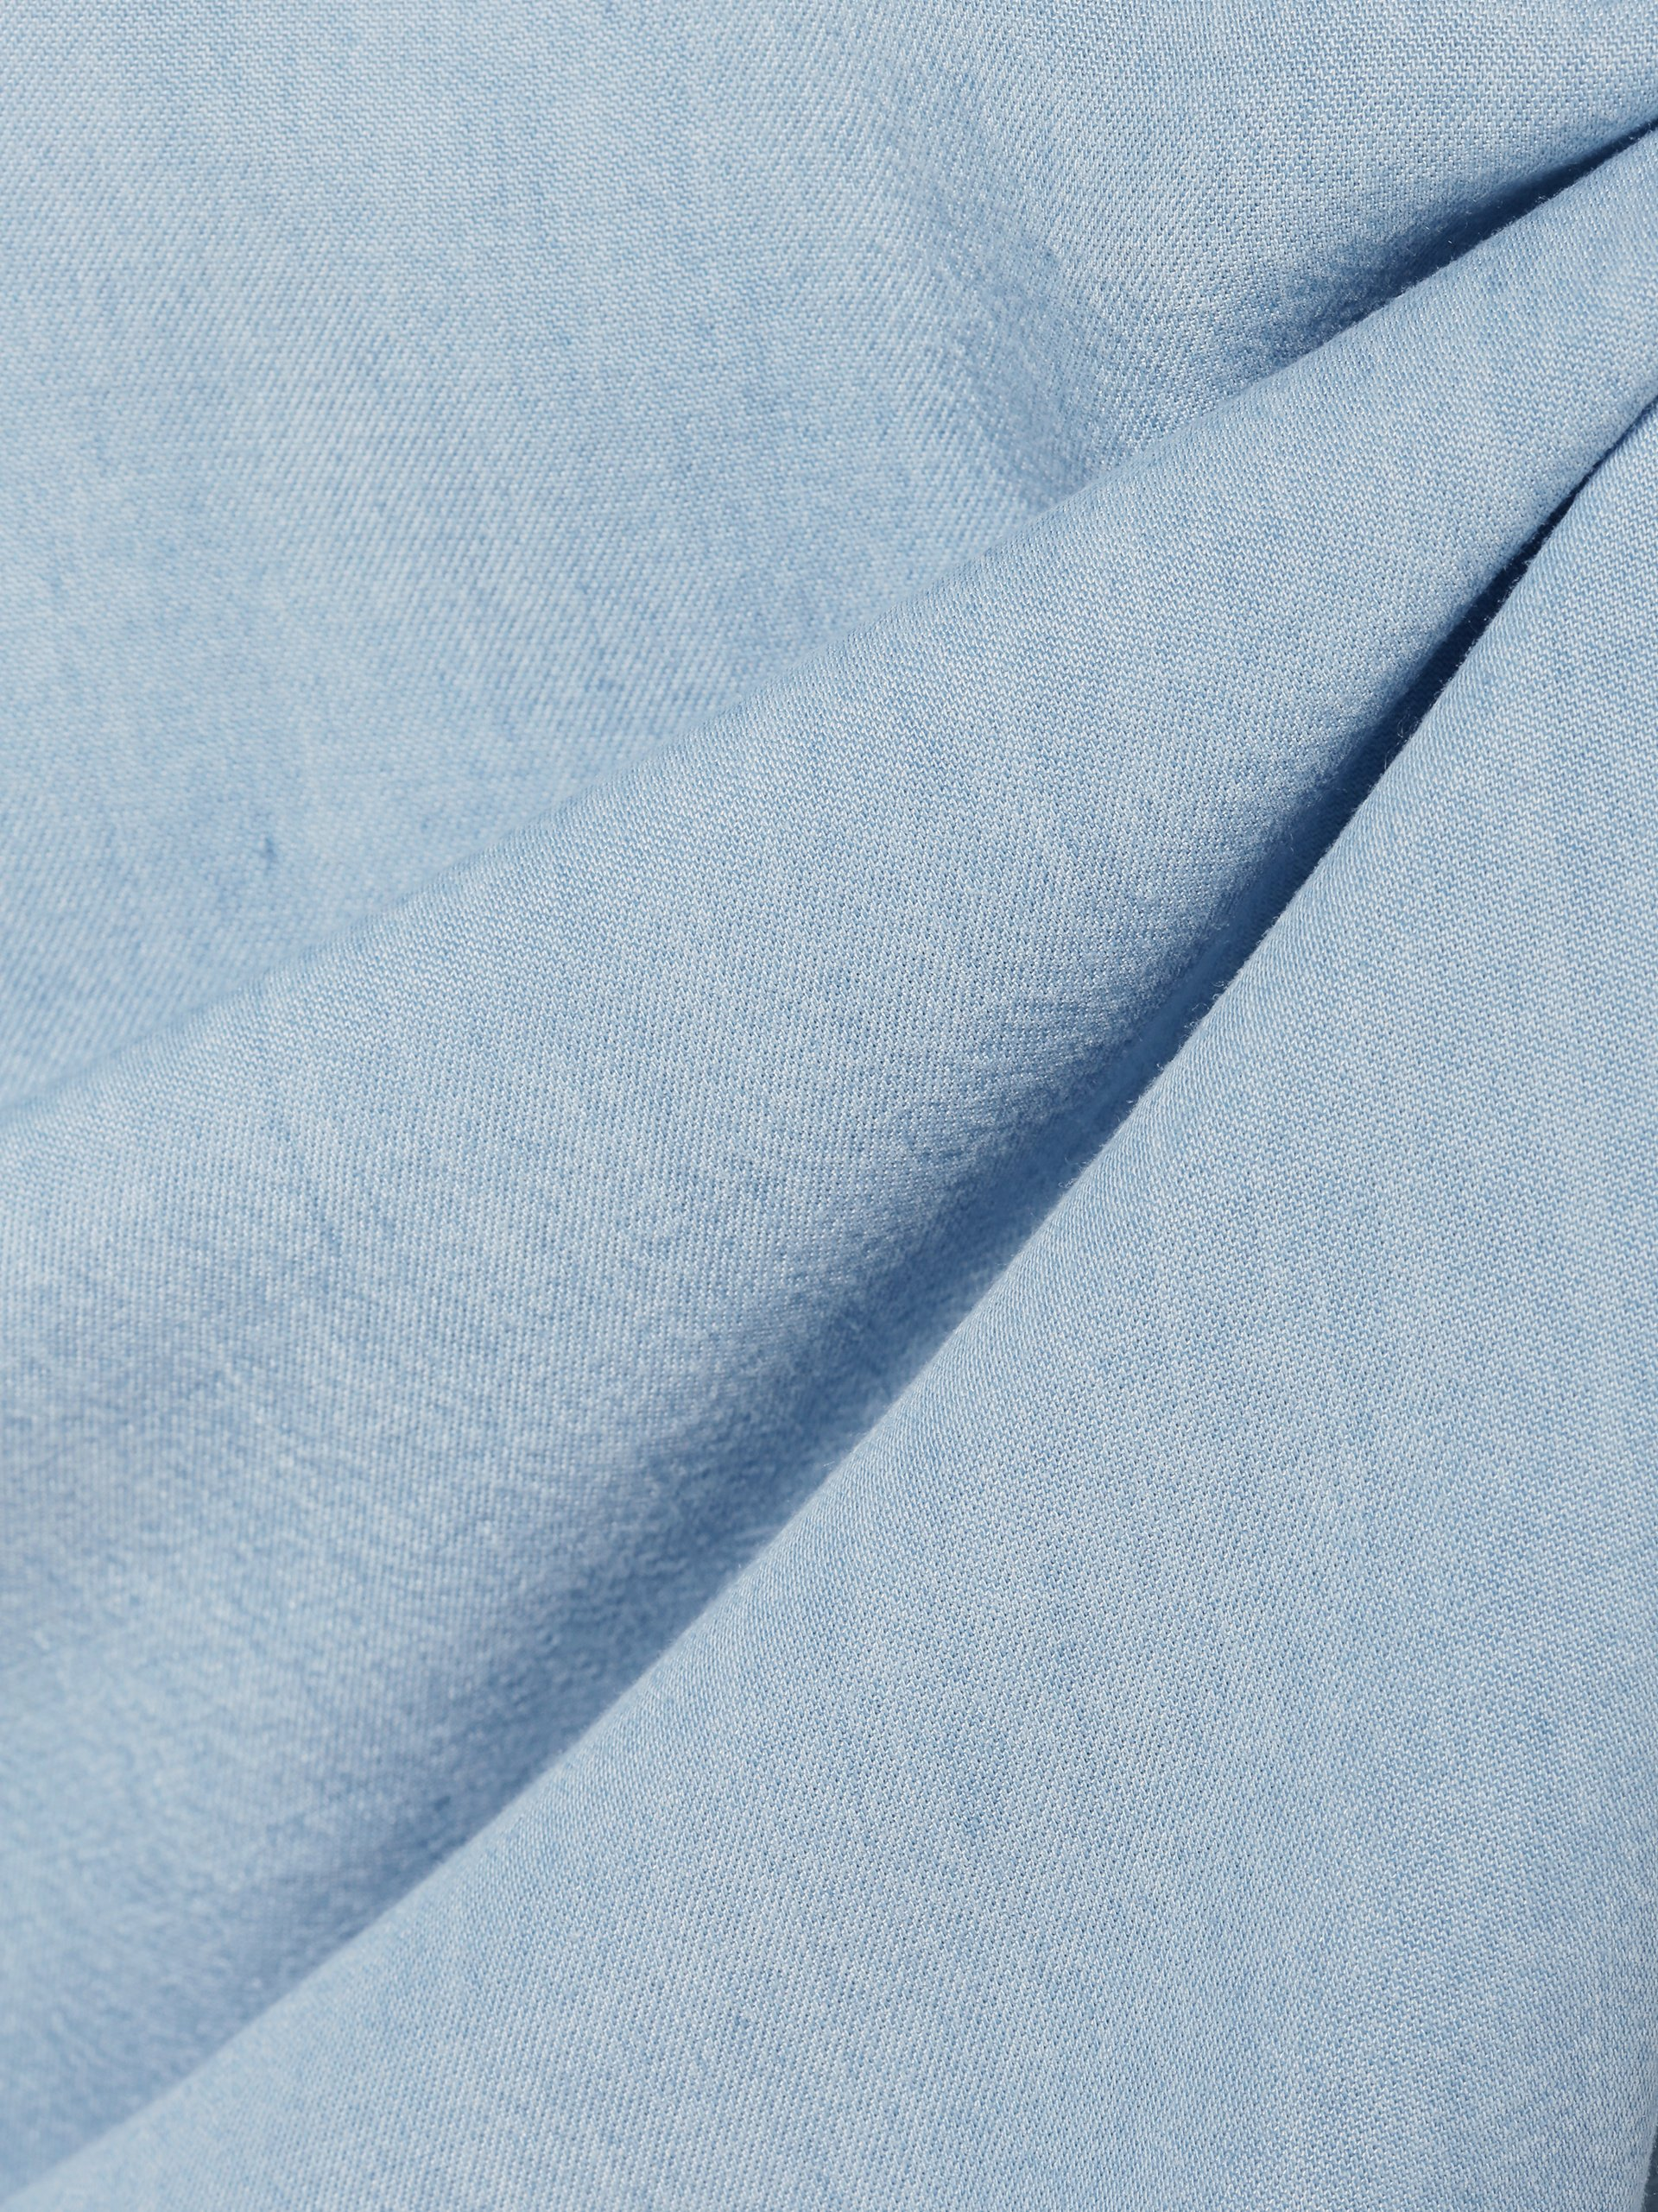 Pepe Jeans Damska koszula jeansowa – Xenia